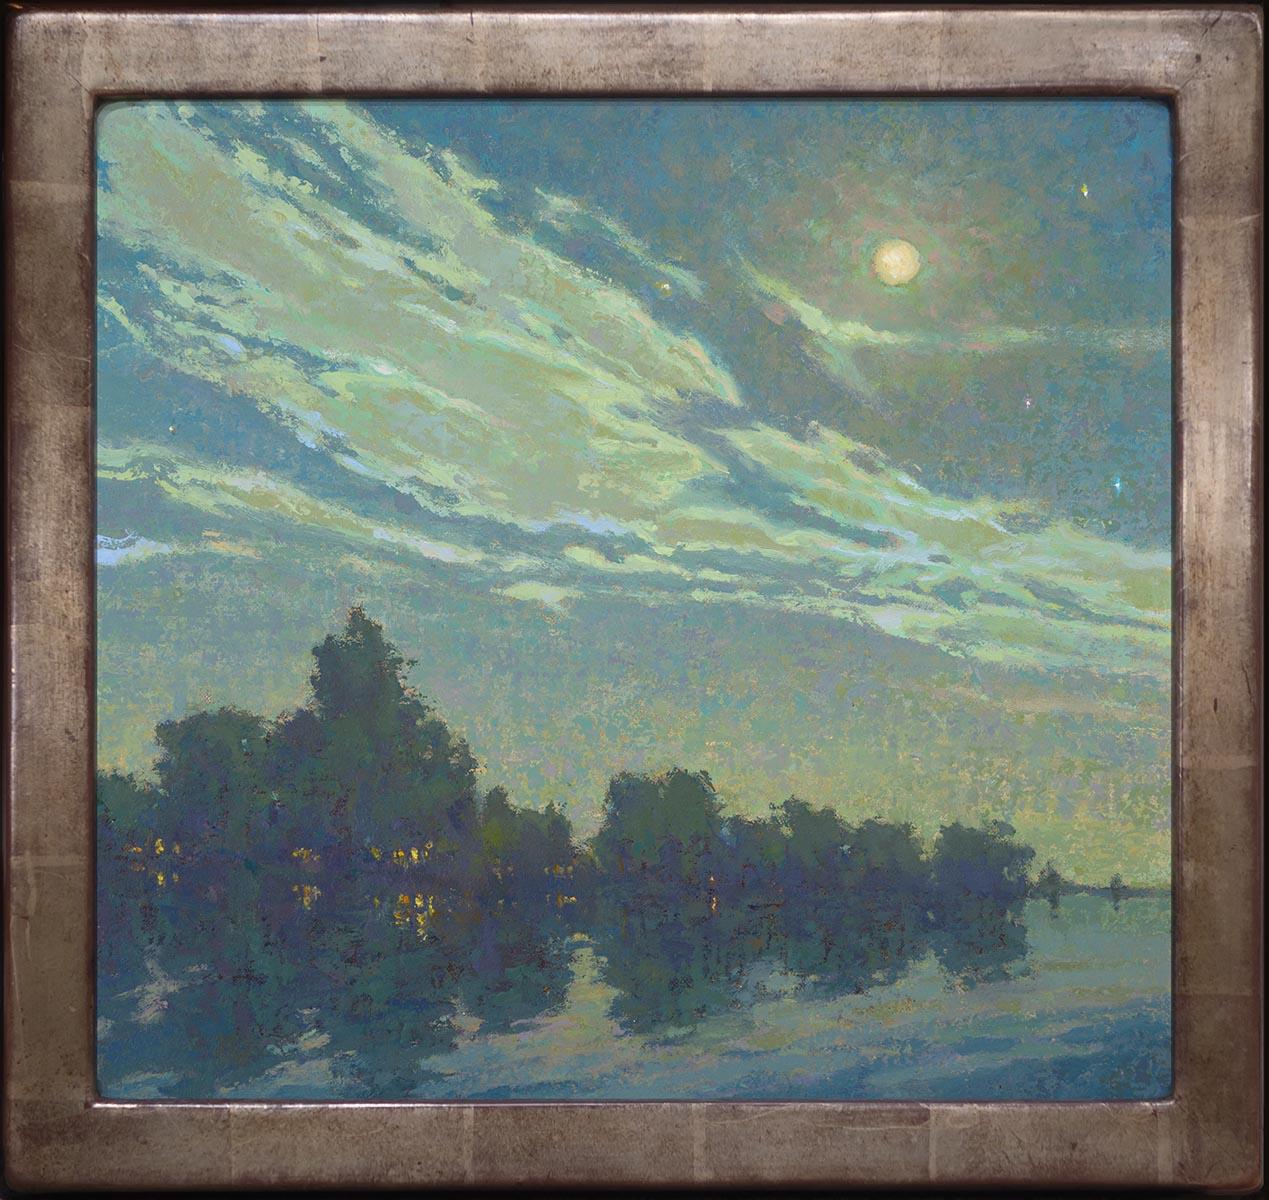 Jennifer Moses Cicadas 14x15 Framed 72 dpi copy.jpg